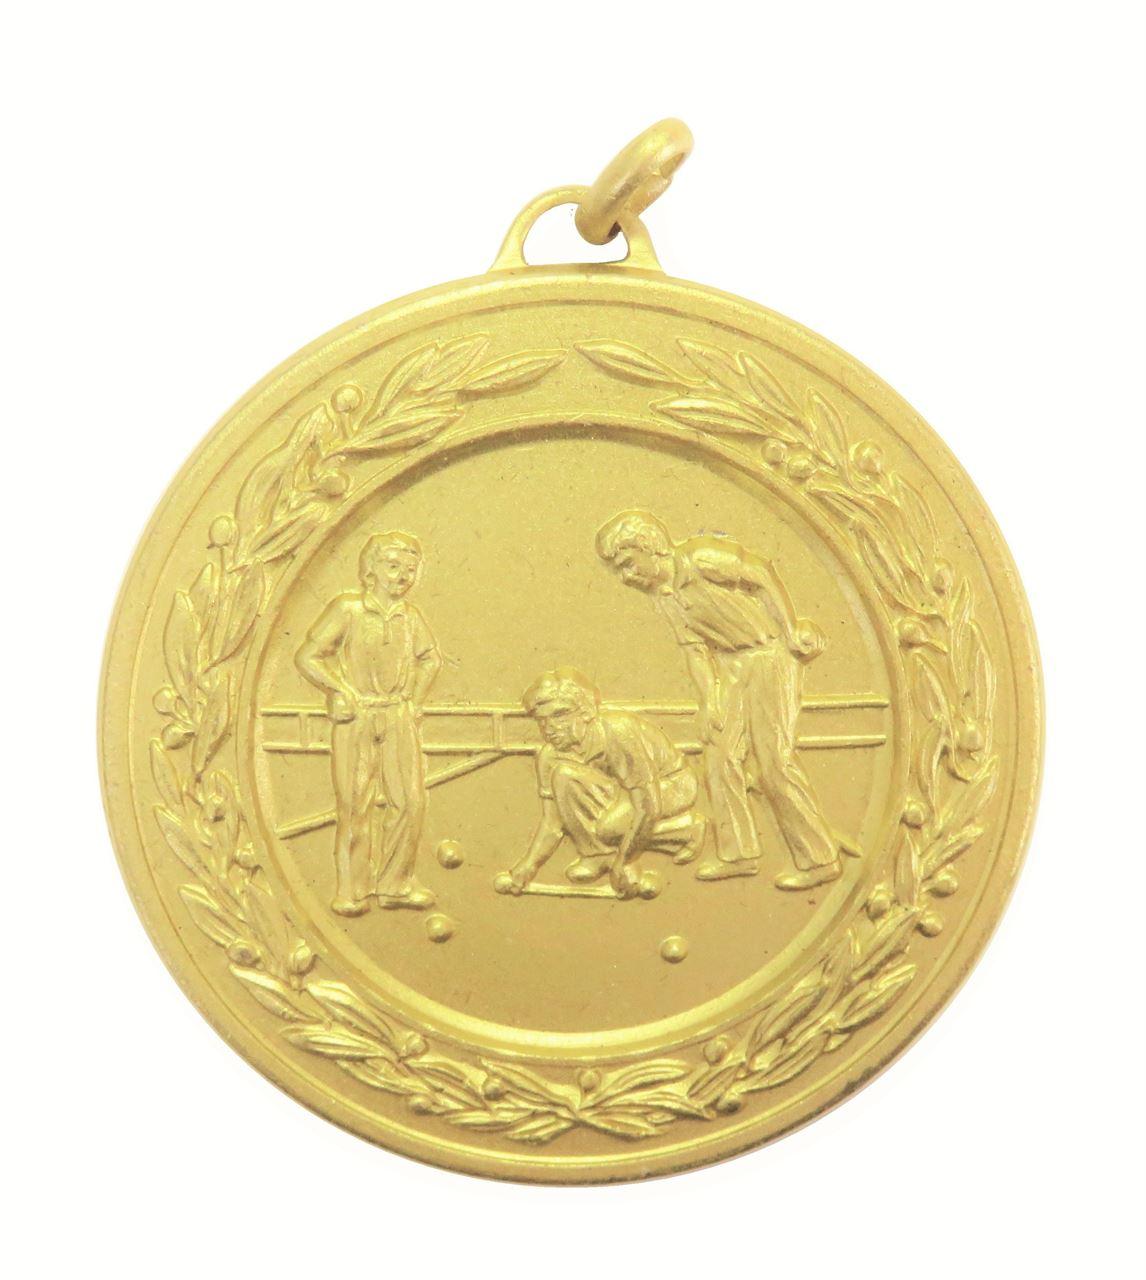 Gold Laurel Economy Lawn Bowls Medal (size: 50mm) - 4265E